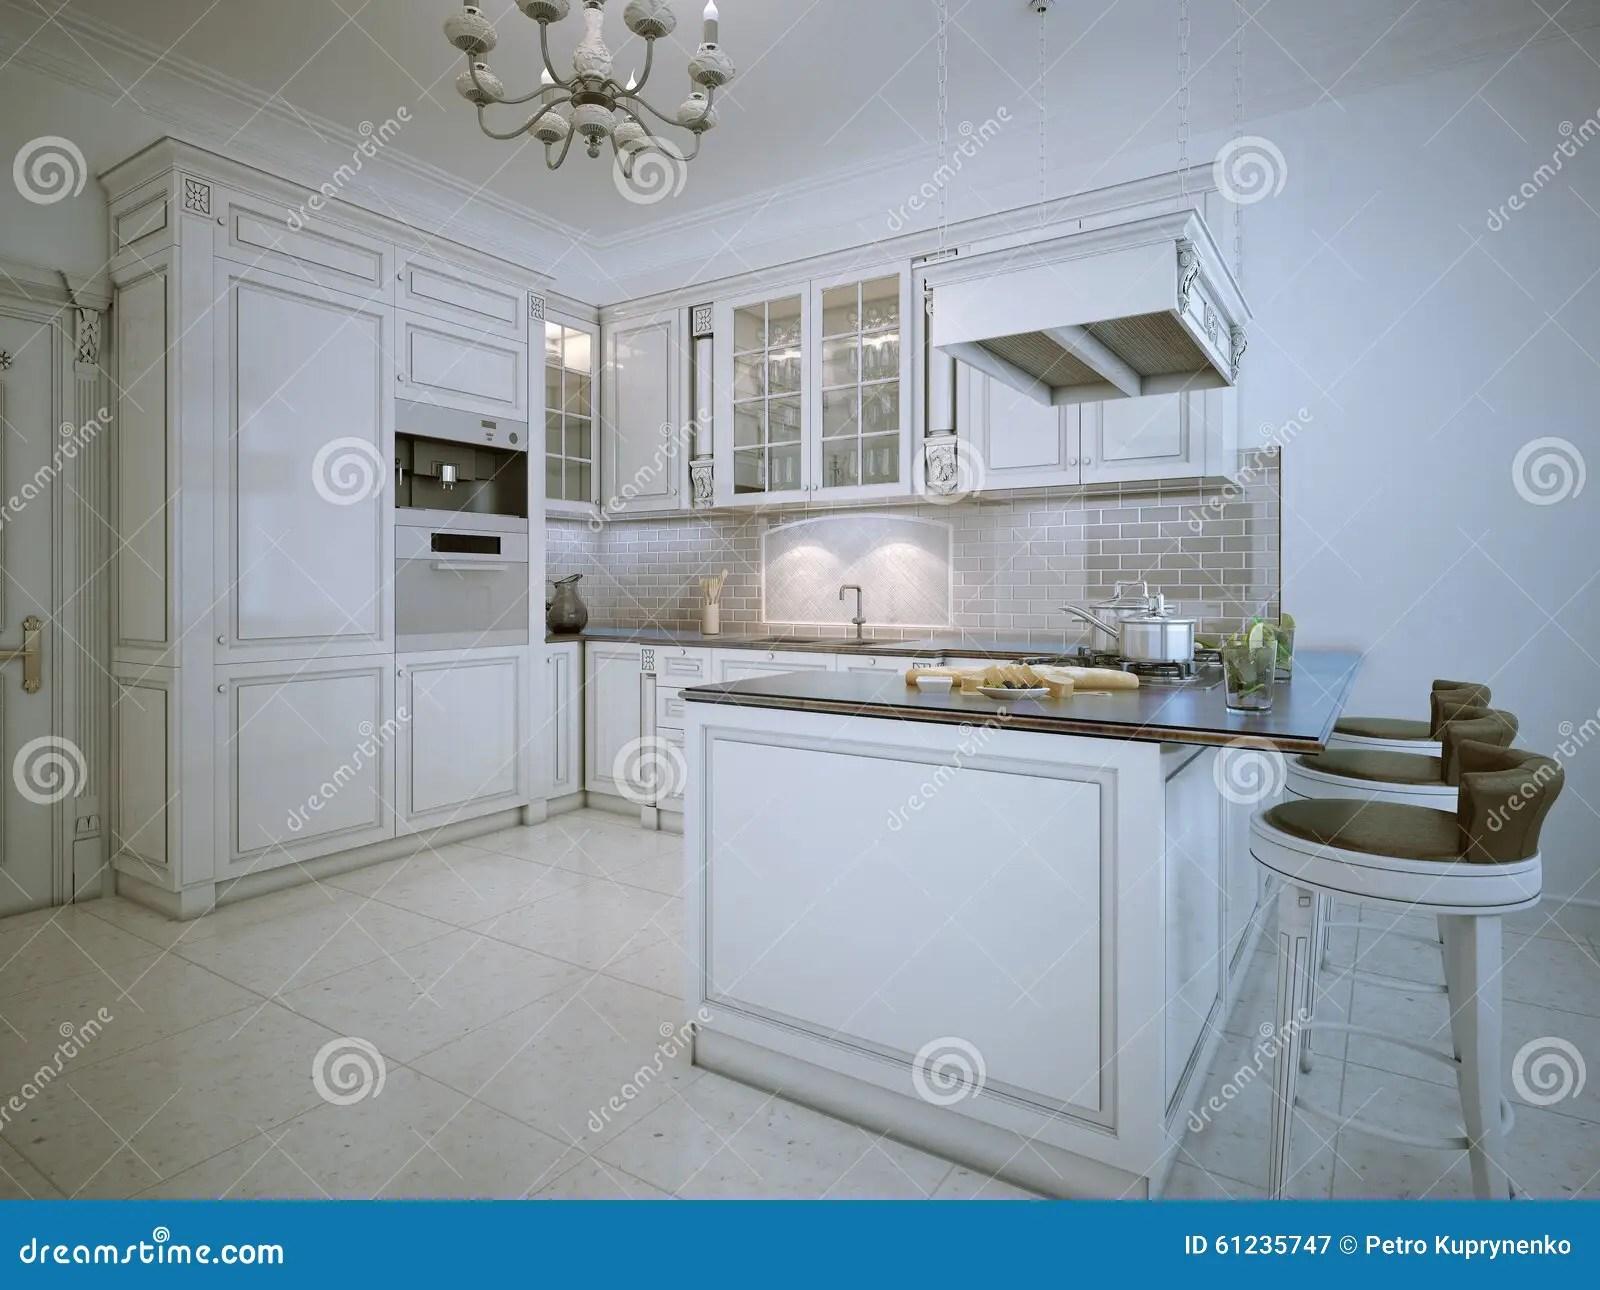 kitchen art decor best value cabinets 厨房艺术装饰样式库存例证 插画包括有楼层 窗帘 微波 感激的 枝形 厨房艺术装饰样式